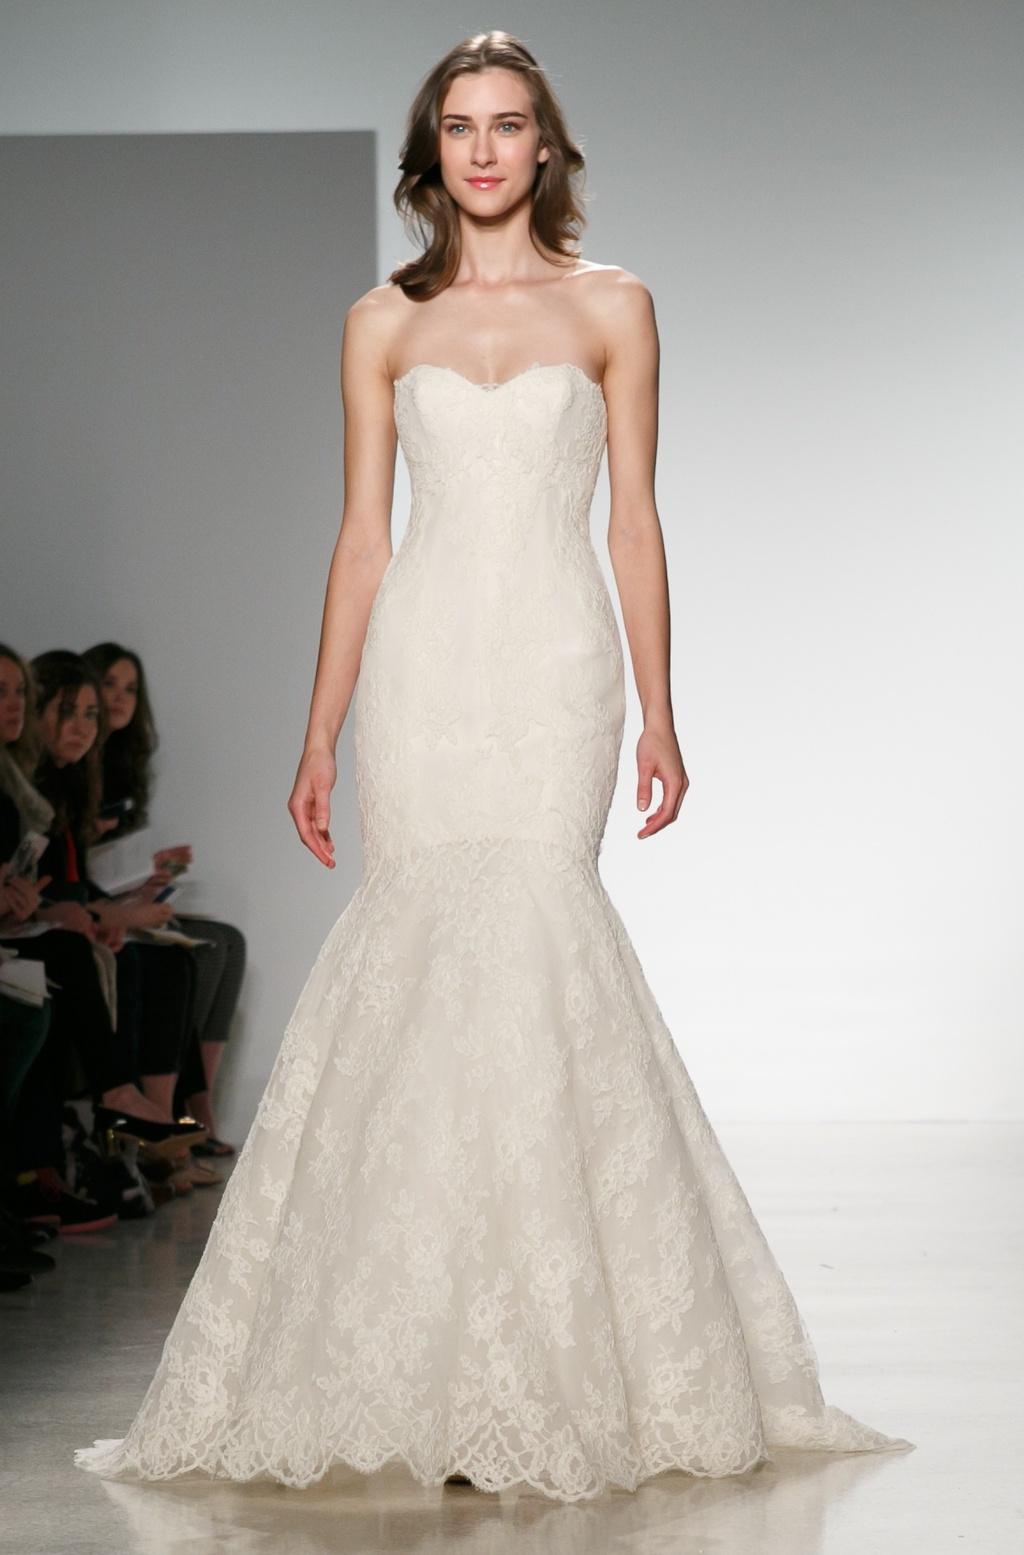 Christos-wedding-dress-spring-2014-bridal-11.full